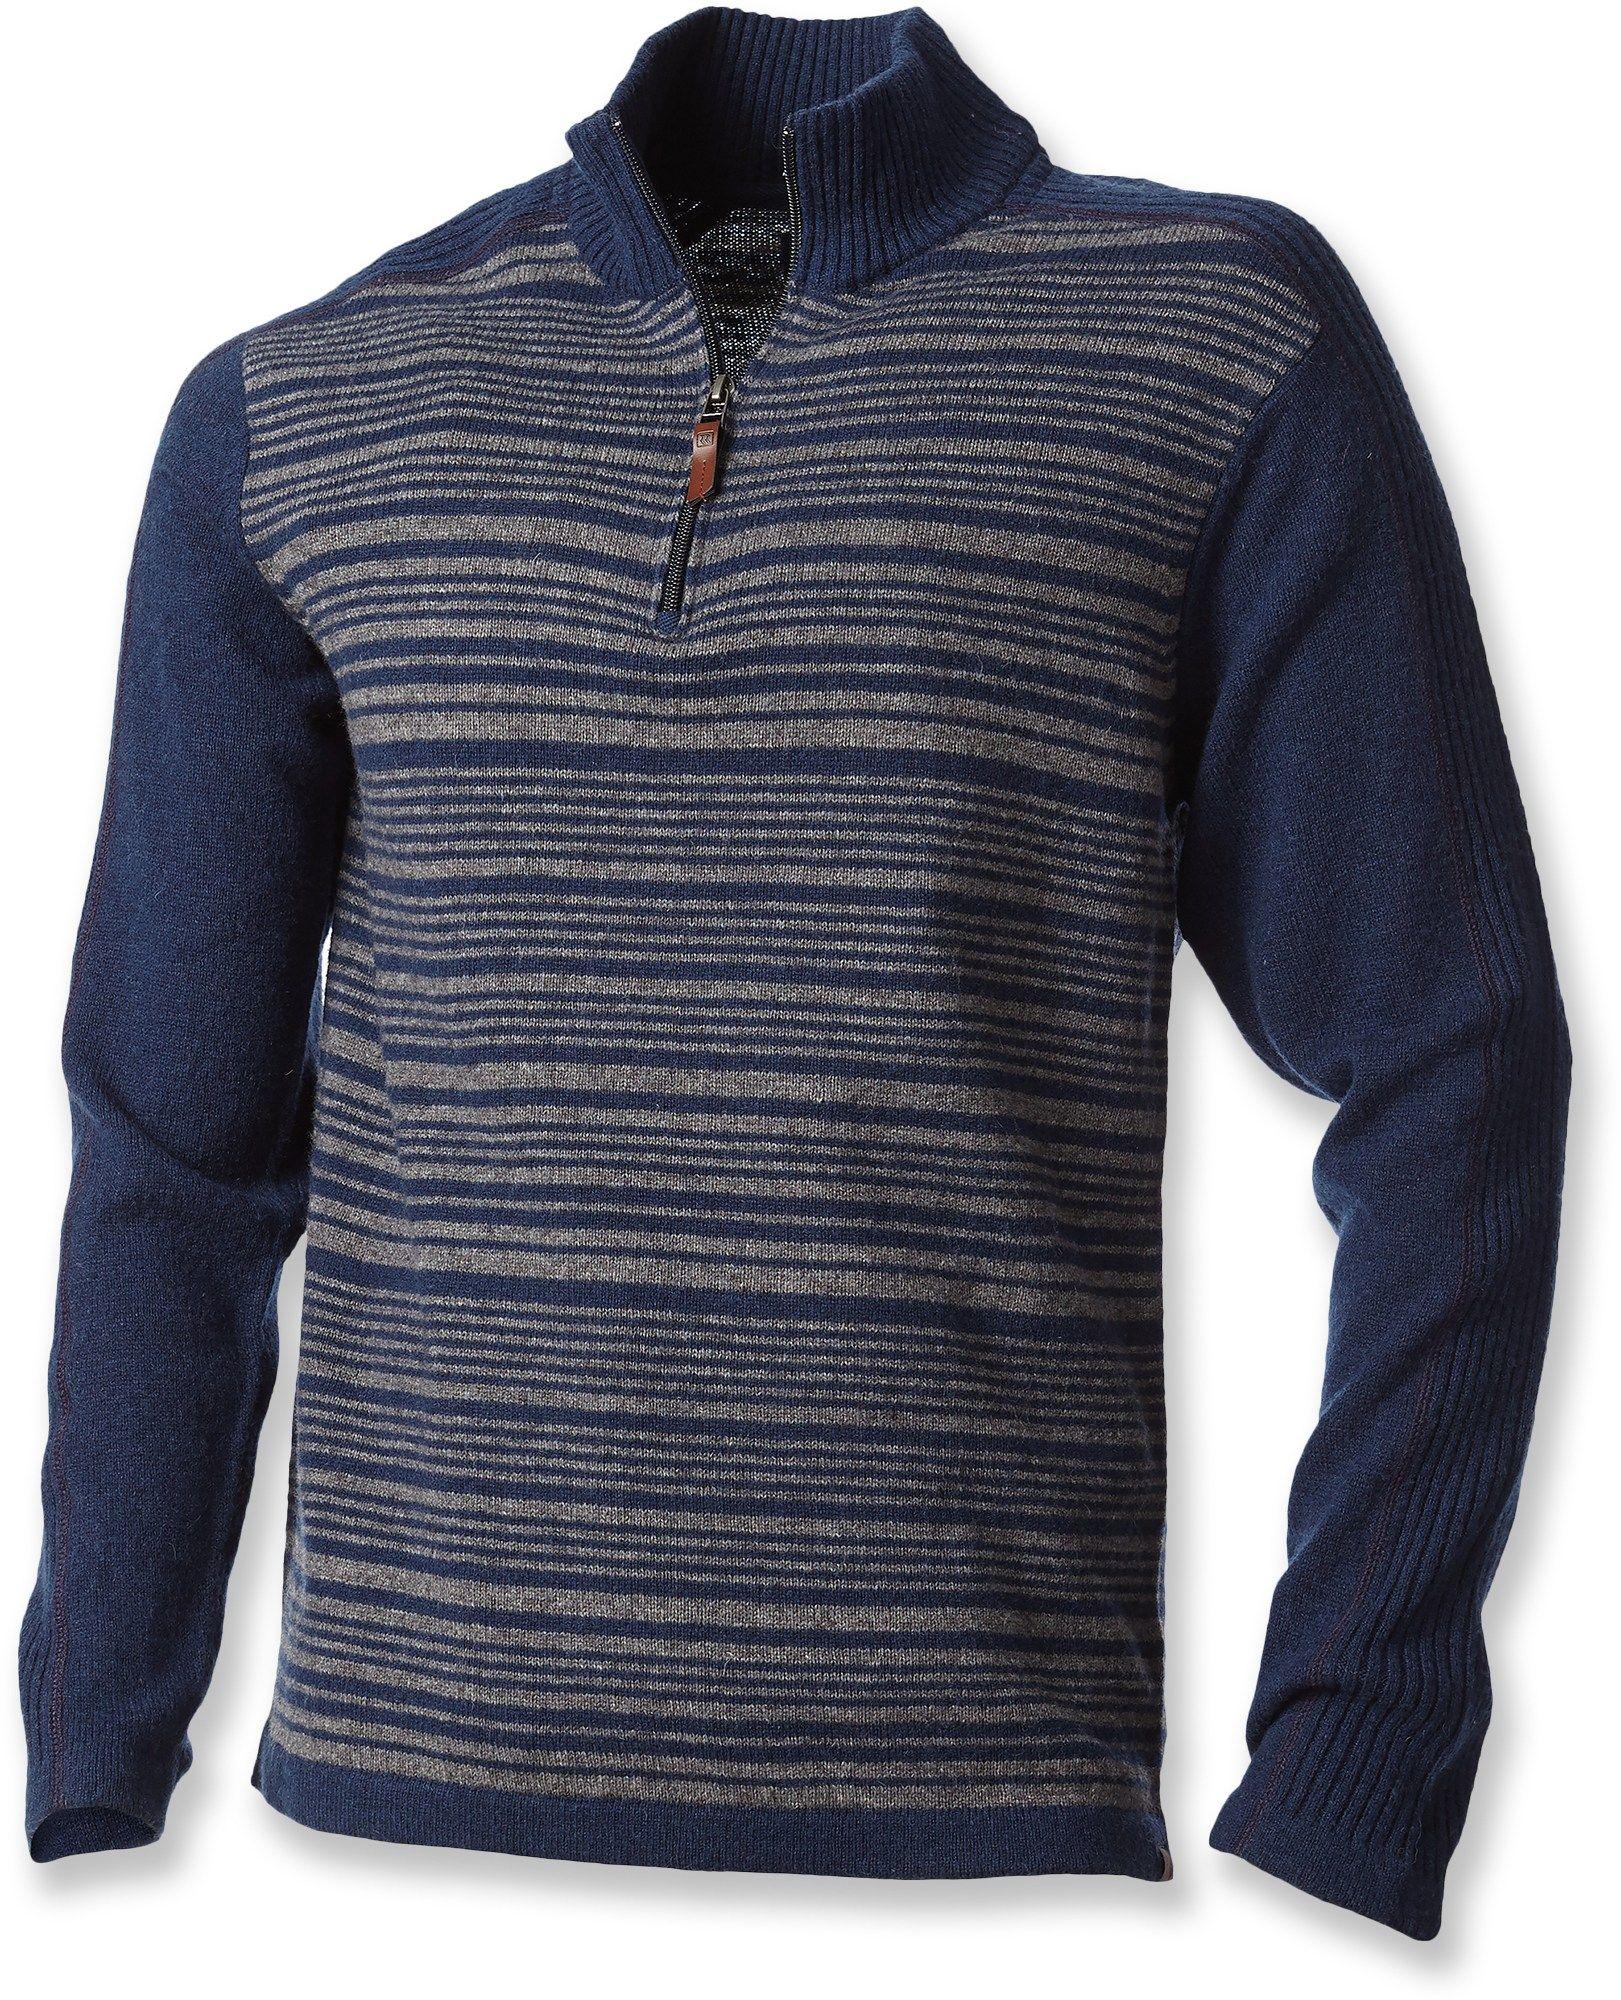 13aaf7982 Fireside Wool Stripe Quarter-Zip Pullover - Men's | *Apparel ...